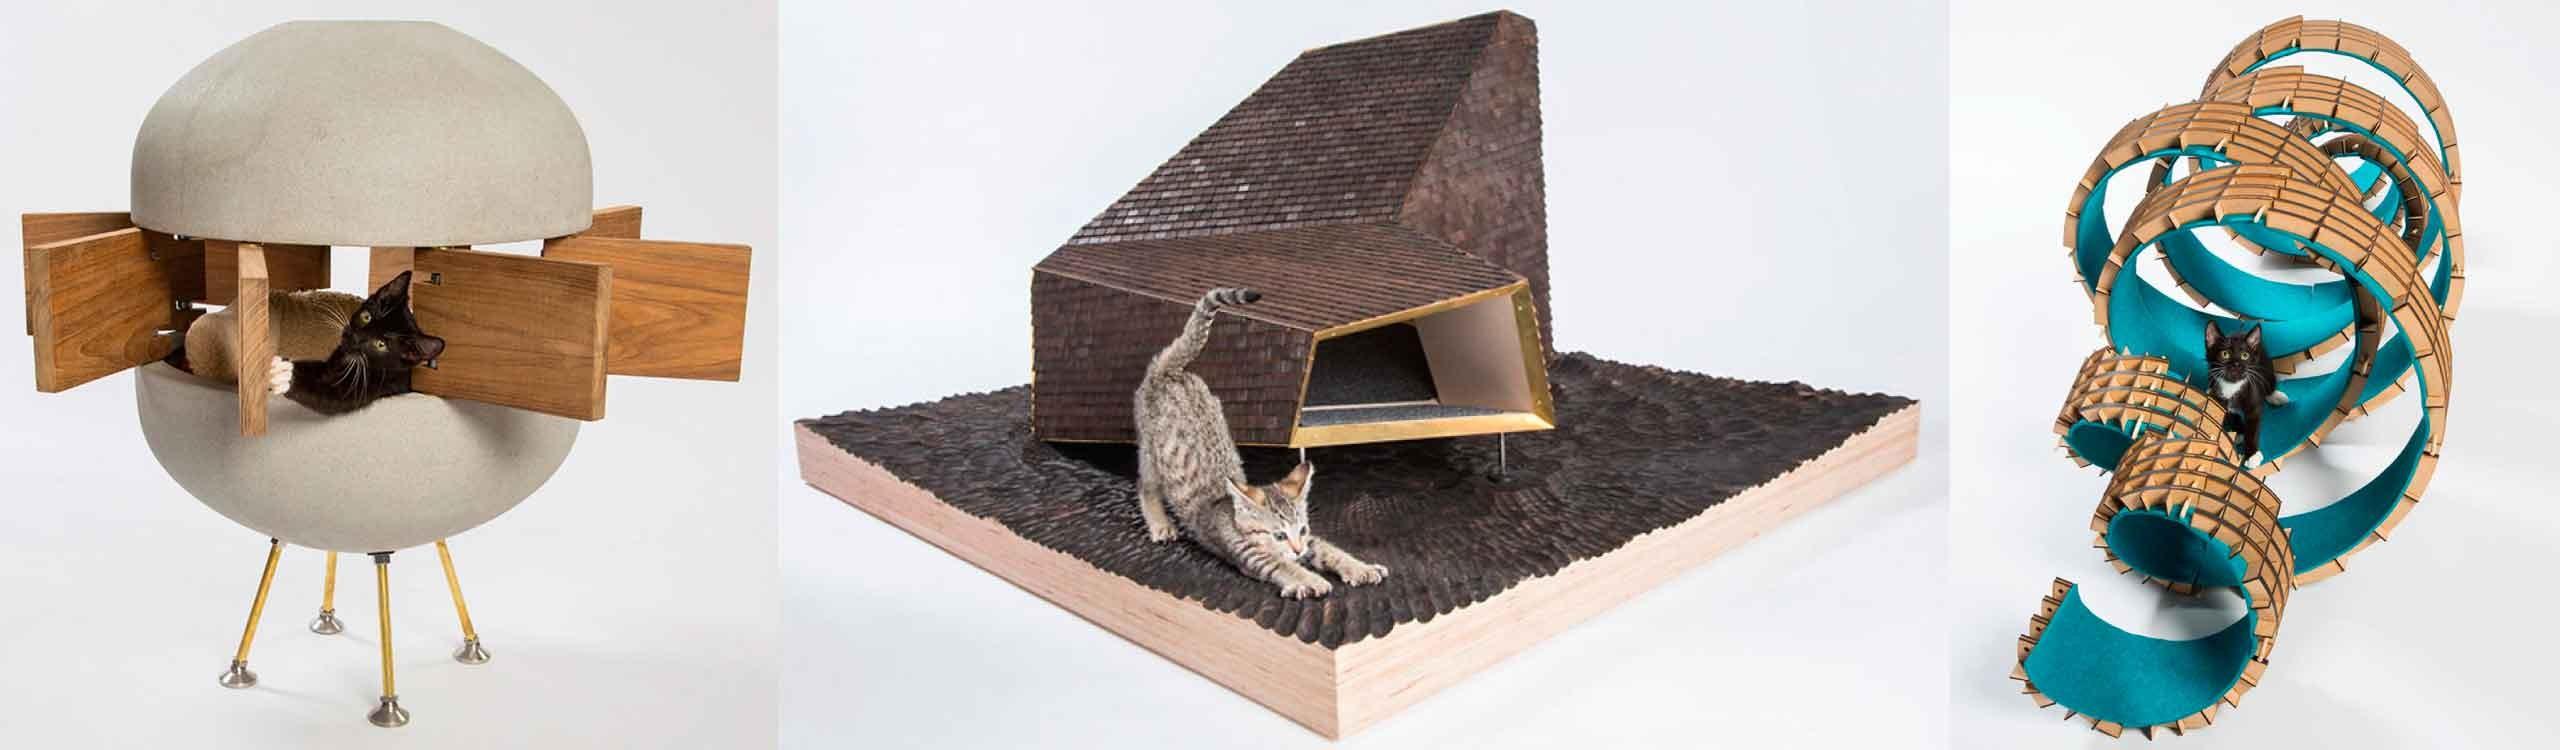 casas-para-gatos-abandonados-mis-gafas-de-pasta-destacado